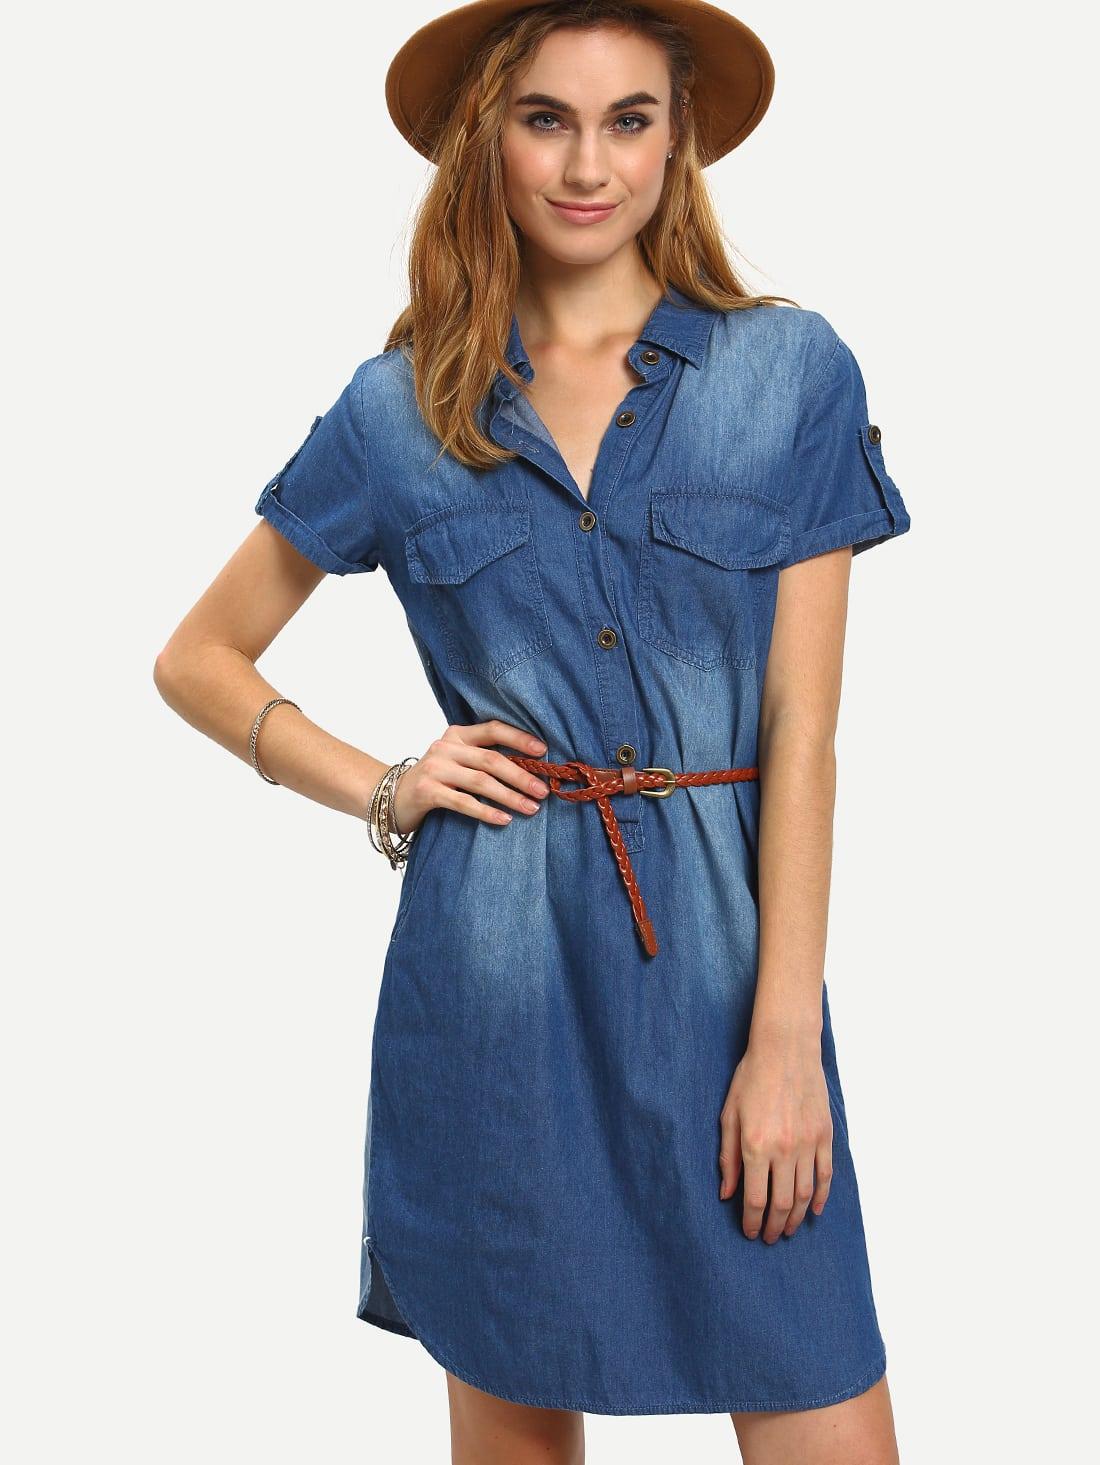 belted dual flap pocket denim shirt dress shein sheinside